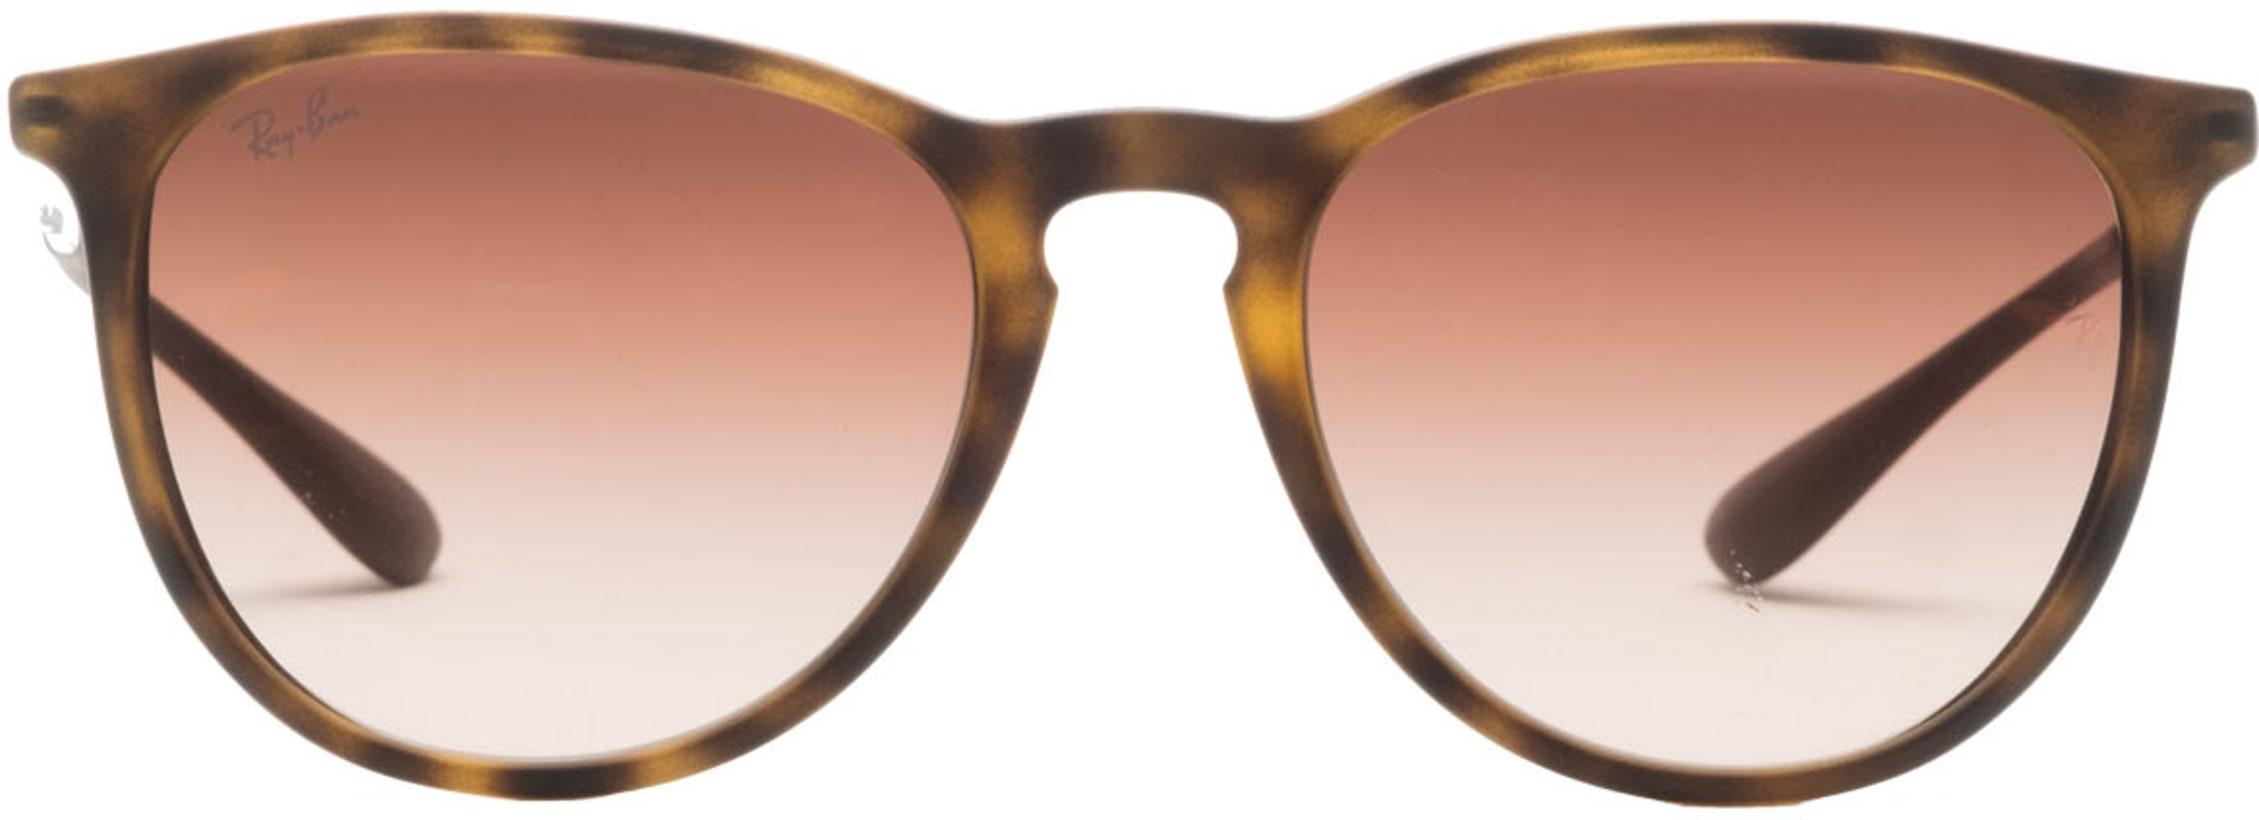 550ca5856b1 Ray-Ban  Erika Classic Sunglasses - Tortoise Gunmetal Brown ...